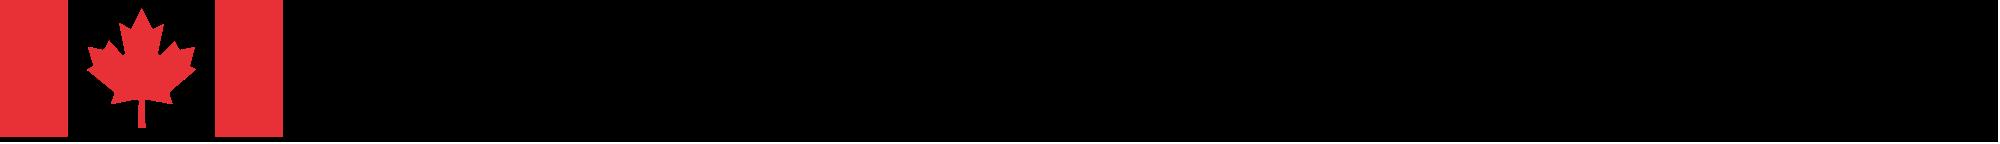 rncan_logo